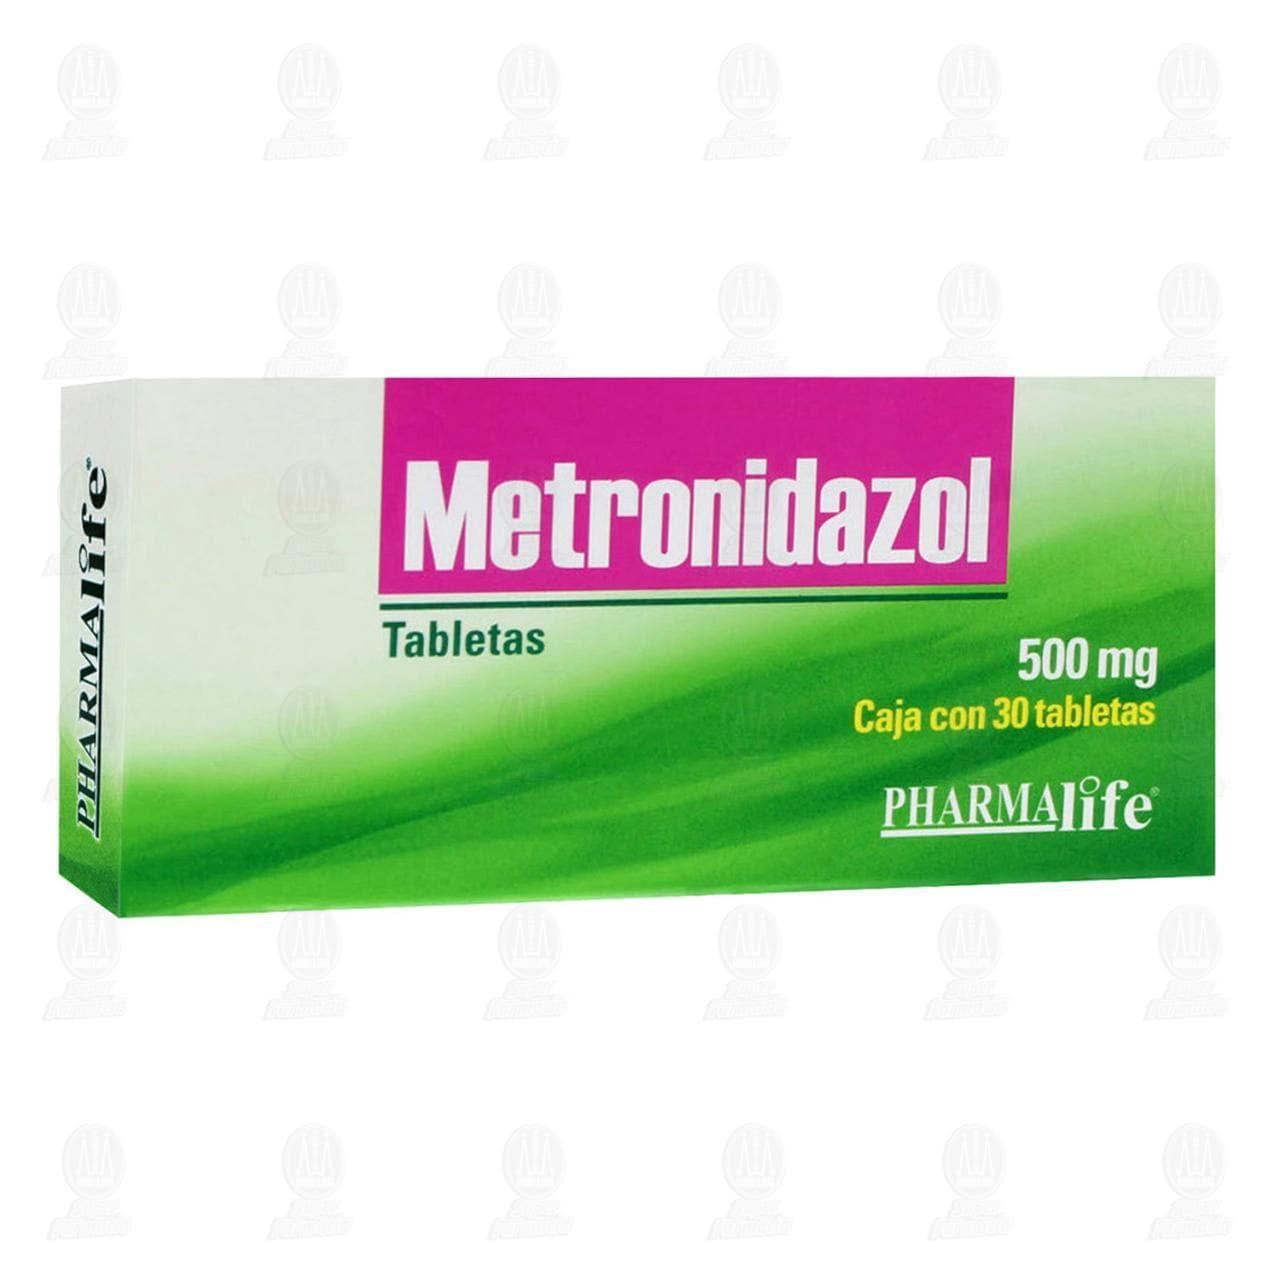 Comprar Metronidazol 500mg 30 Tabletas Pharmalife en Farmacias Guadalajara